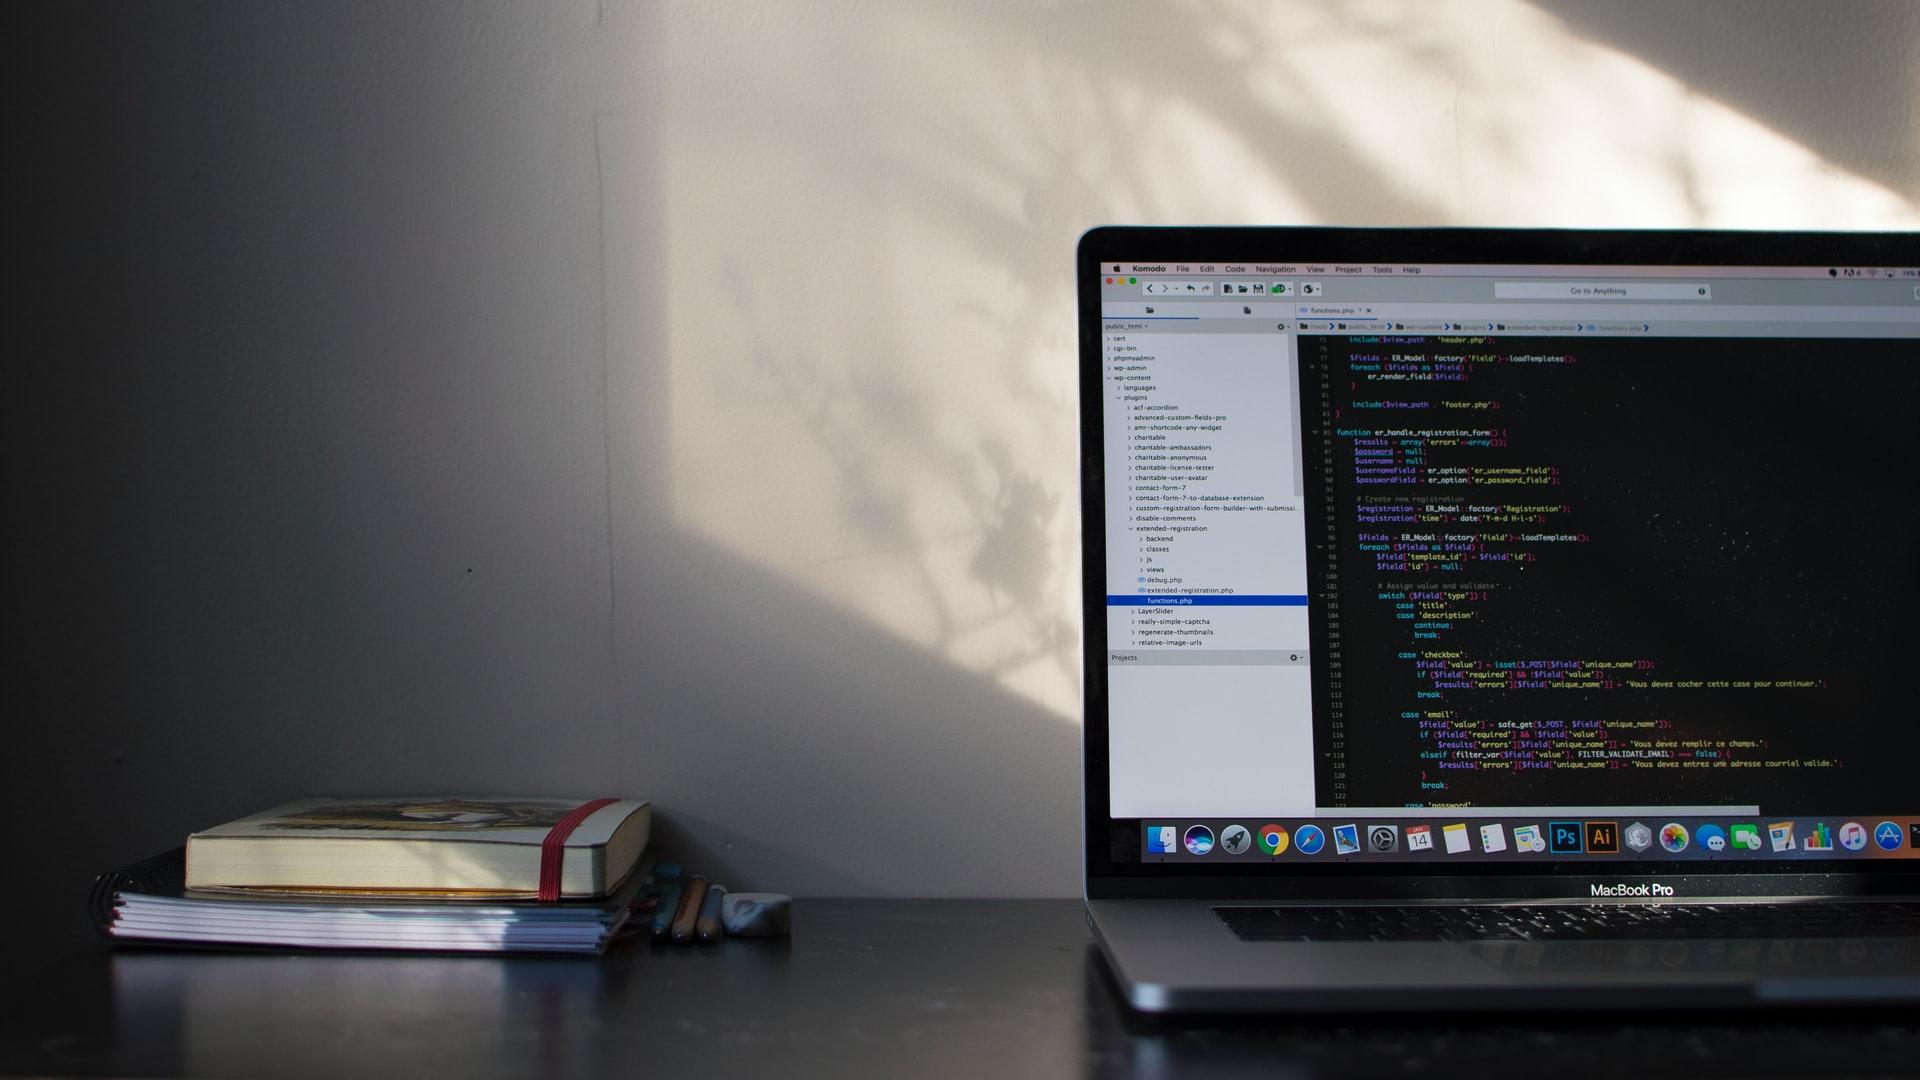 Codes on macbook pro